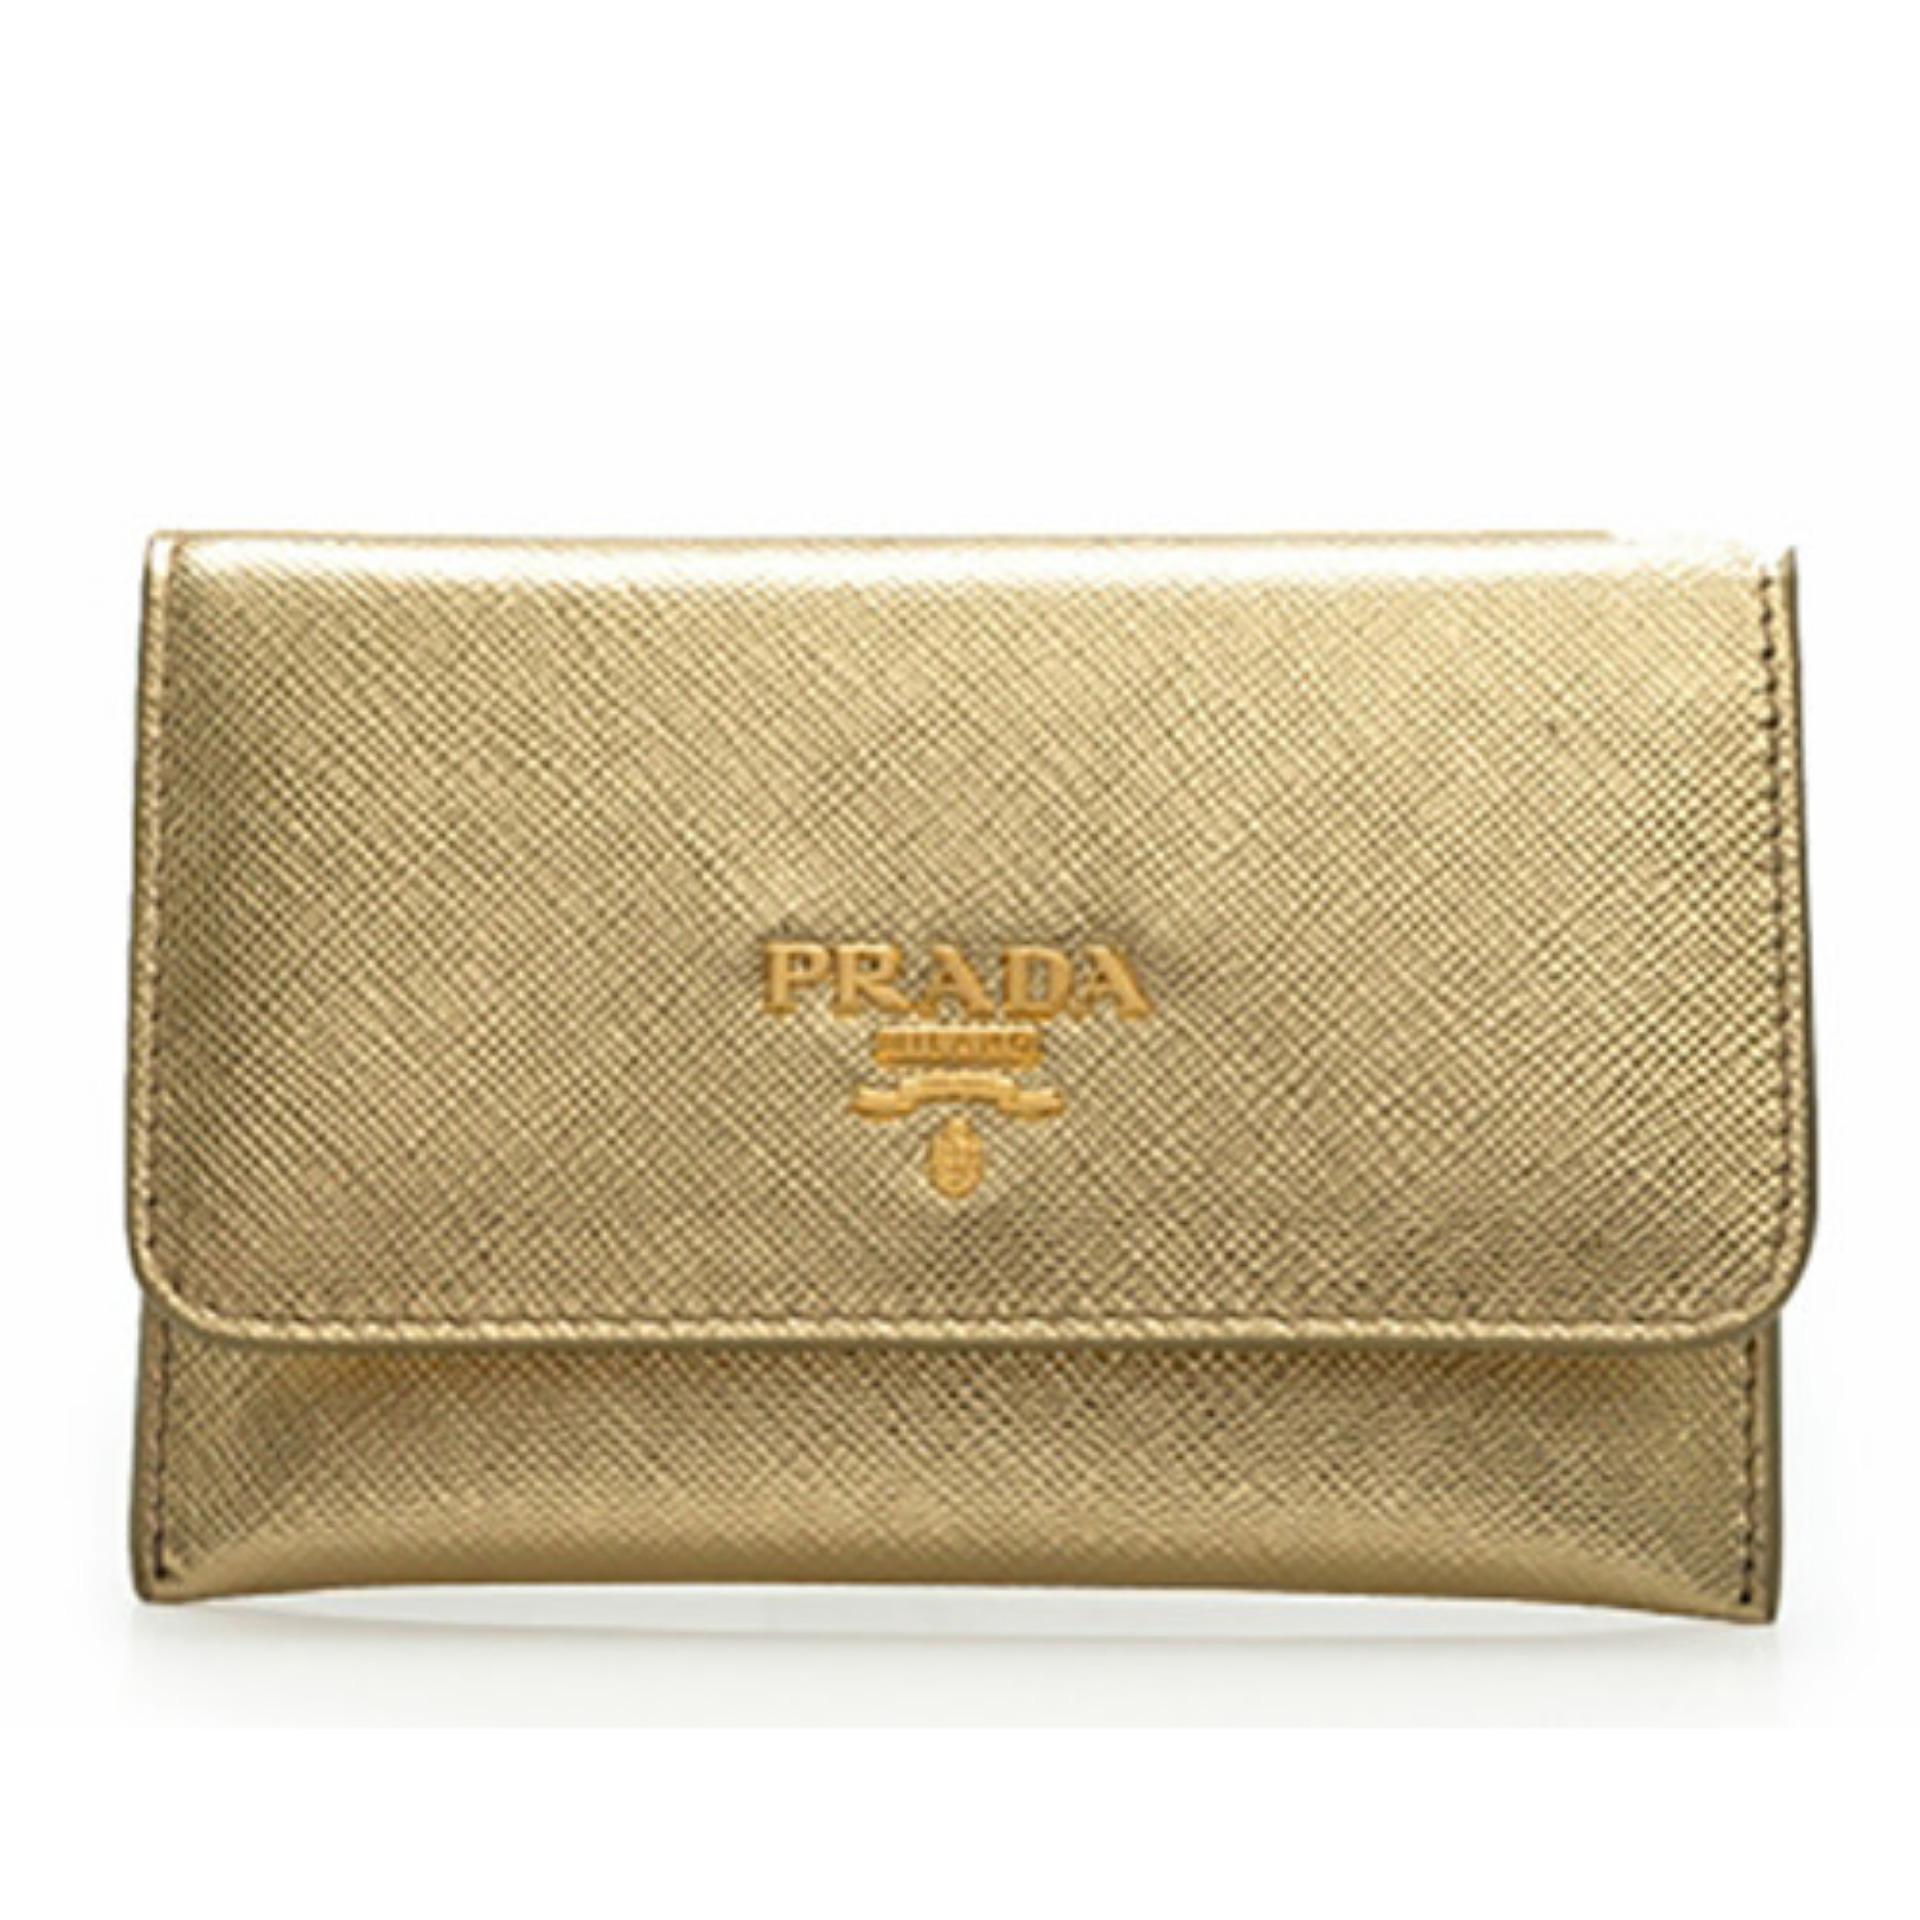 Prada Saffiano Metal Card Holder Wallet (Platino)   1MC362QWAF0522 507846a3f7